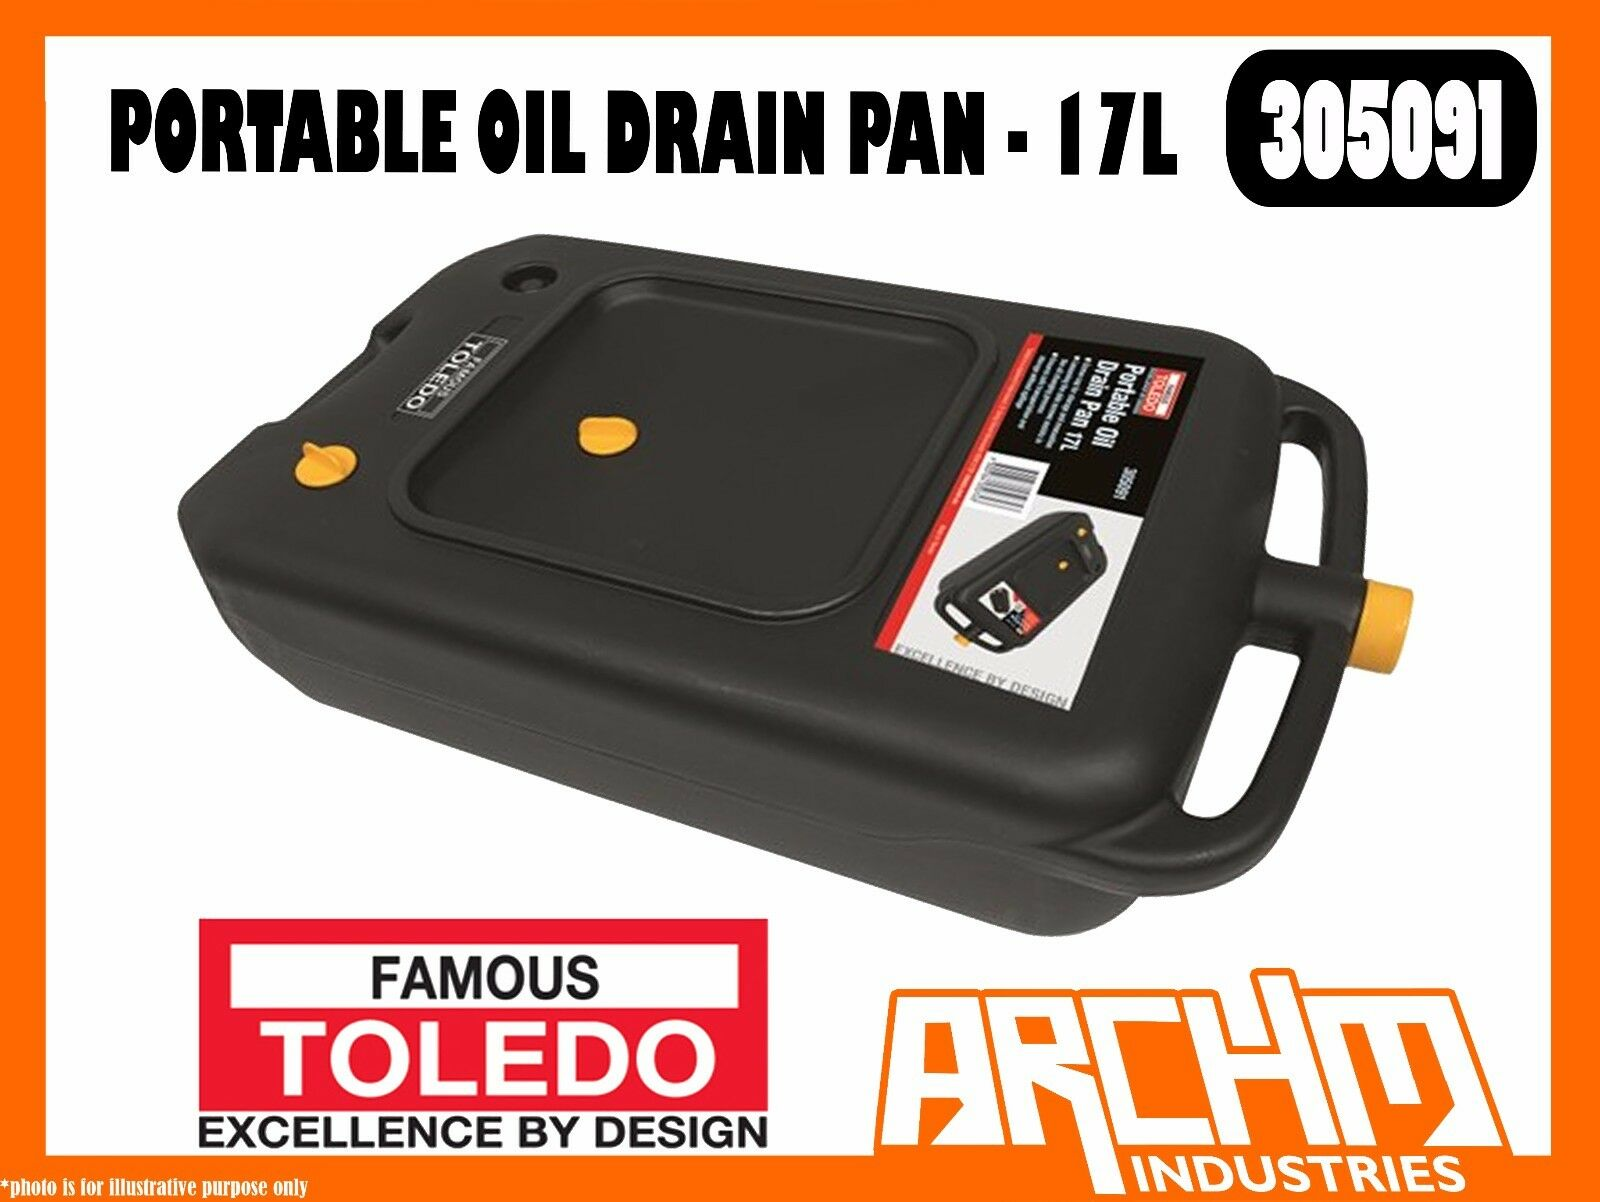 TOLEDO 305091 - PORTABLE OIL DRAIN PAN - 17L - STORAGE EVACUATION DURABLE